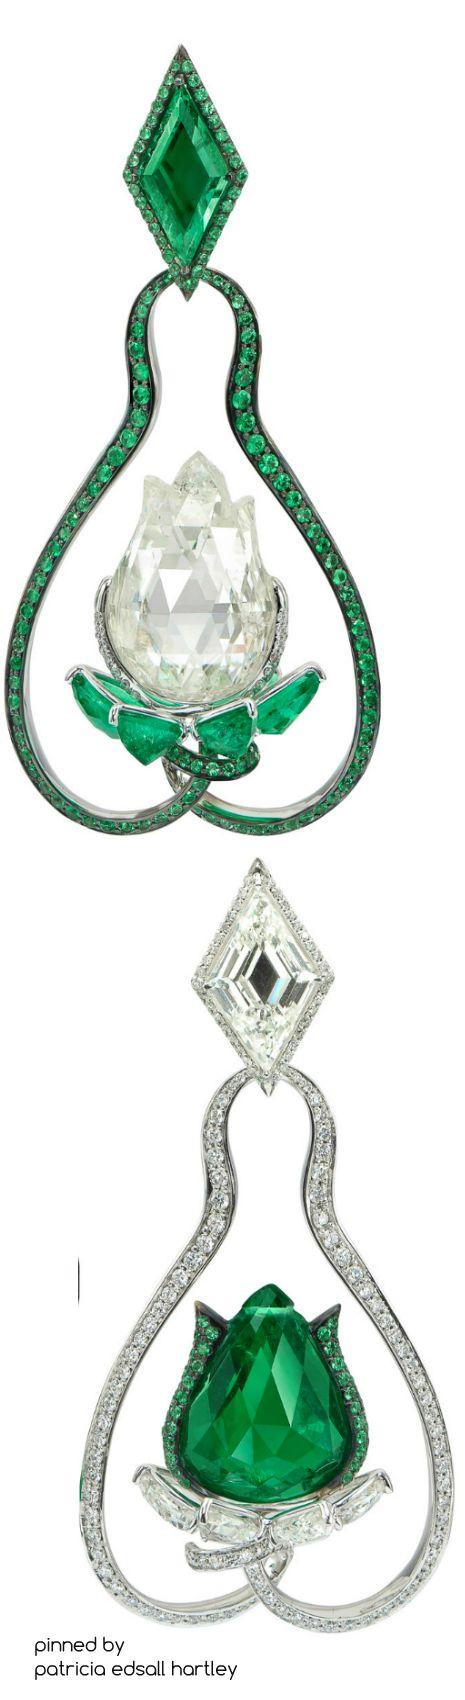 Boghossian High Jewellery emerald and diamond lotus flower earrings